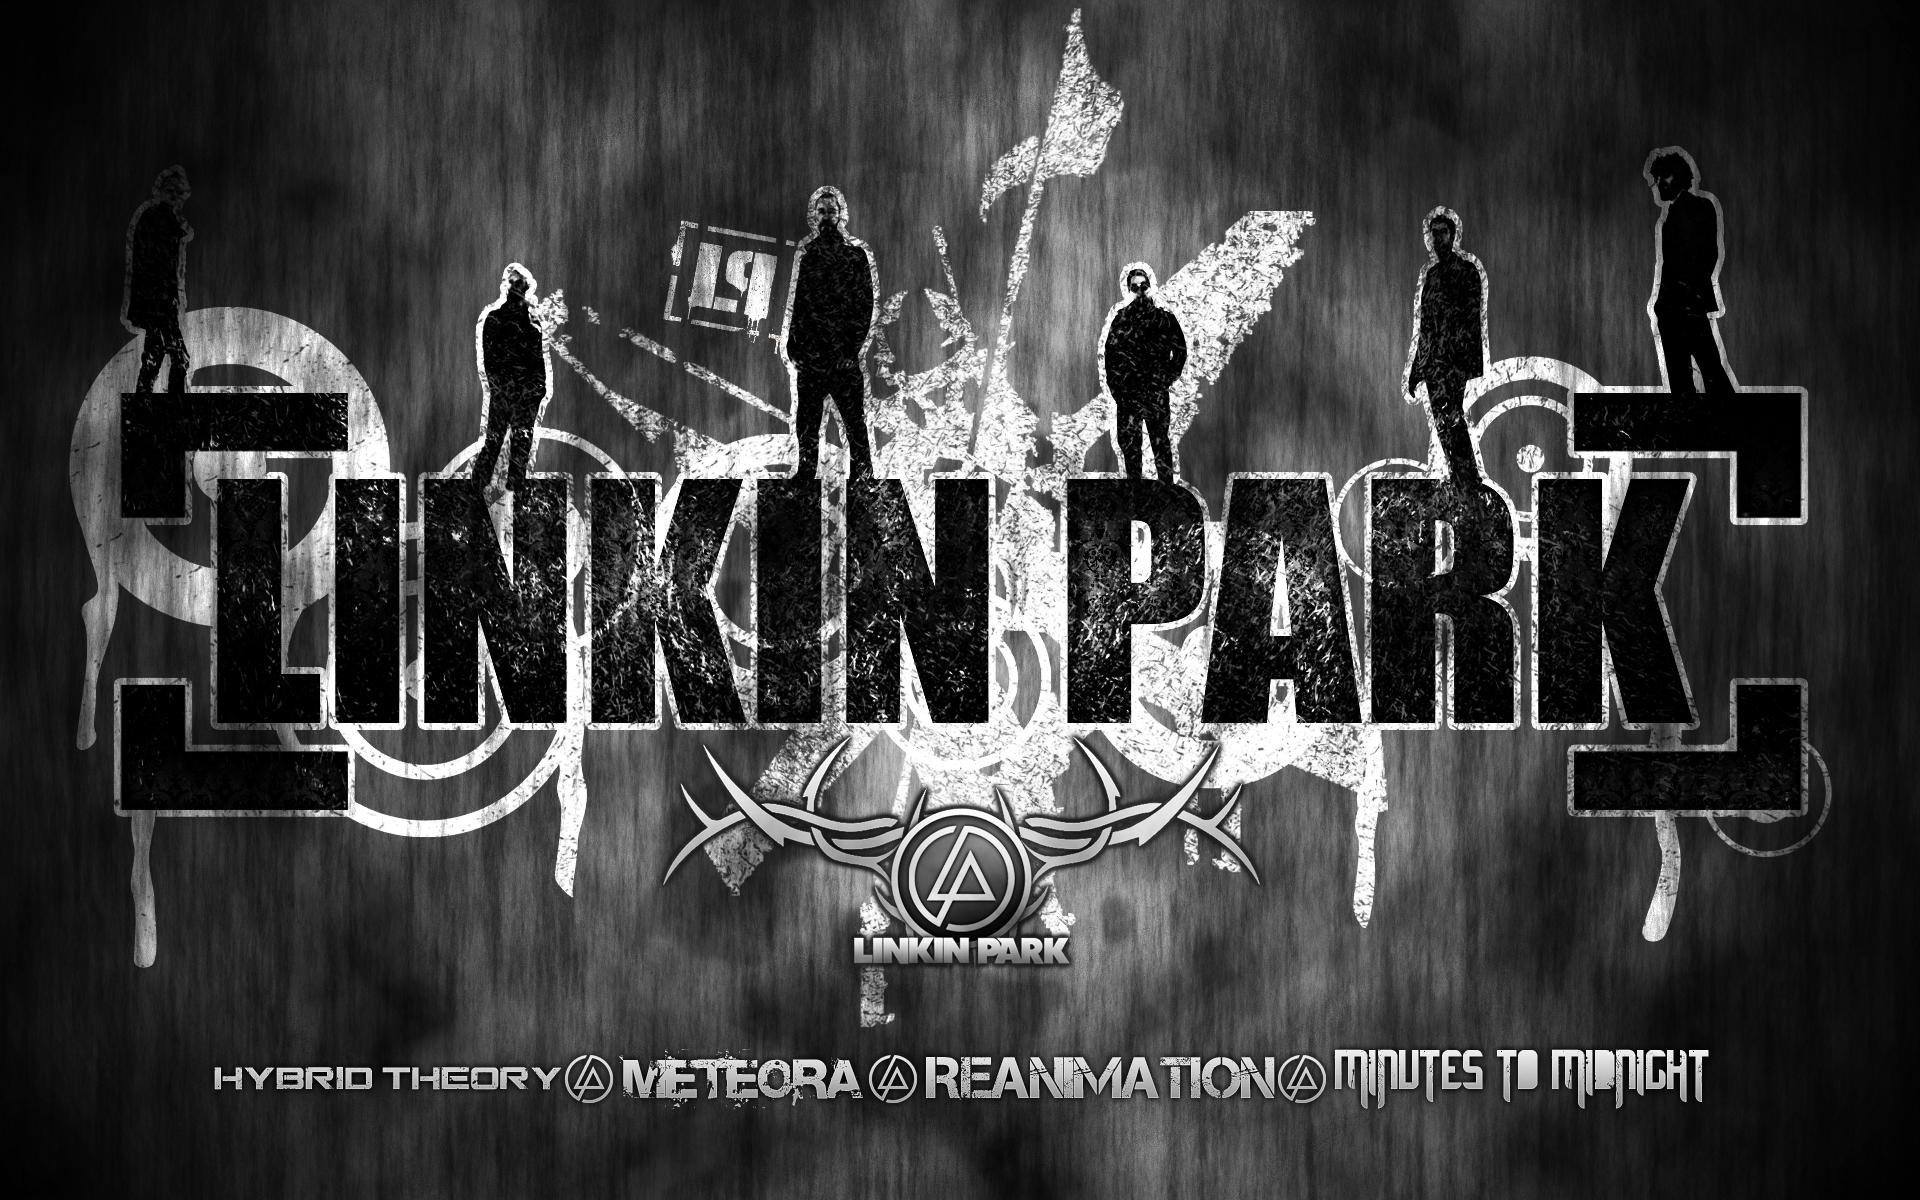 Linkin Park Wallpaper 1920x1200 43584